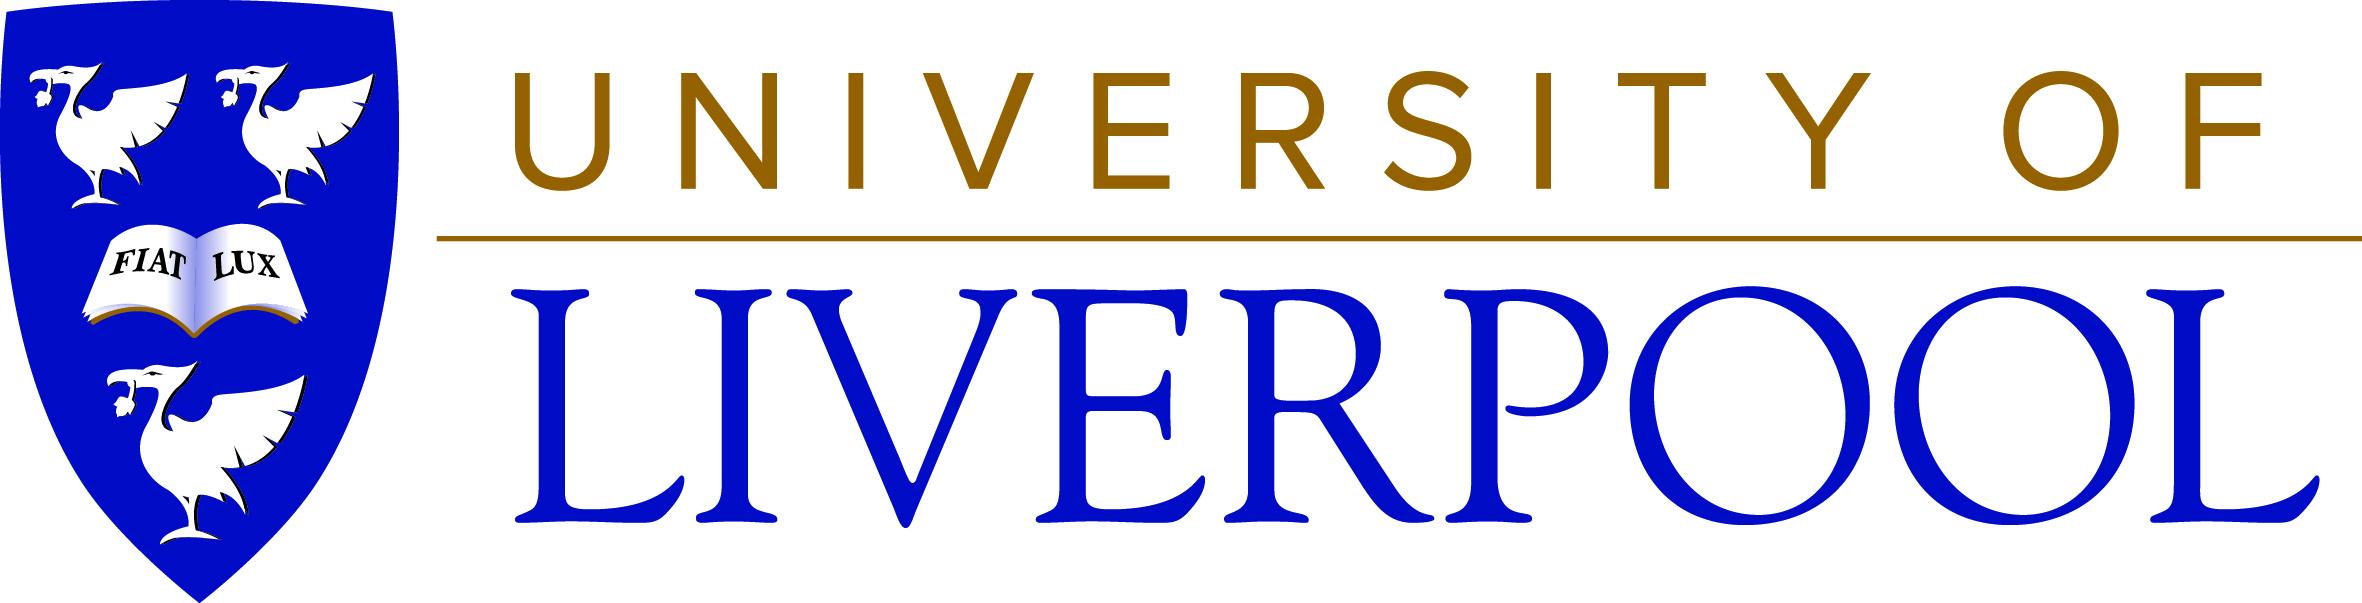 University of Liverpool logo